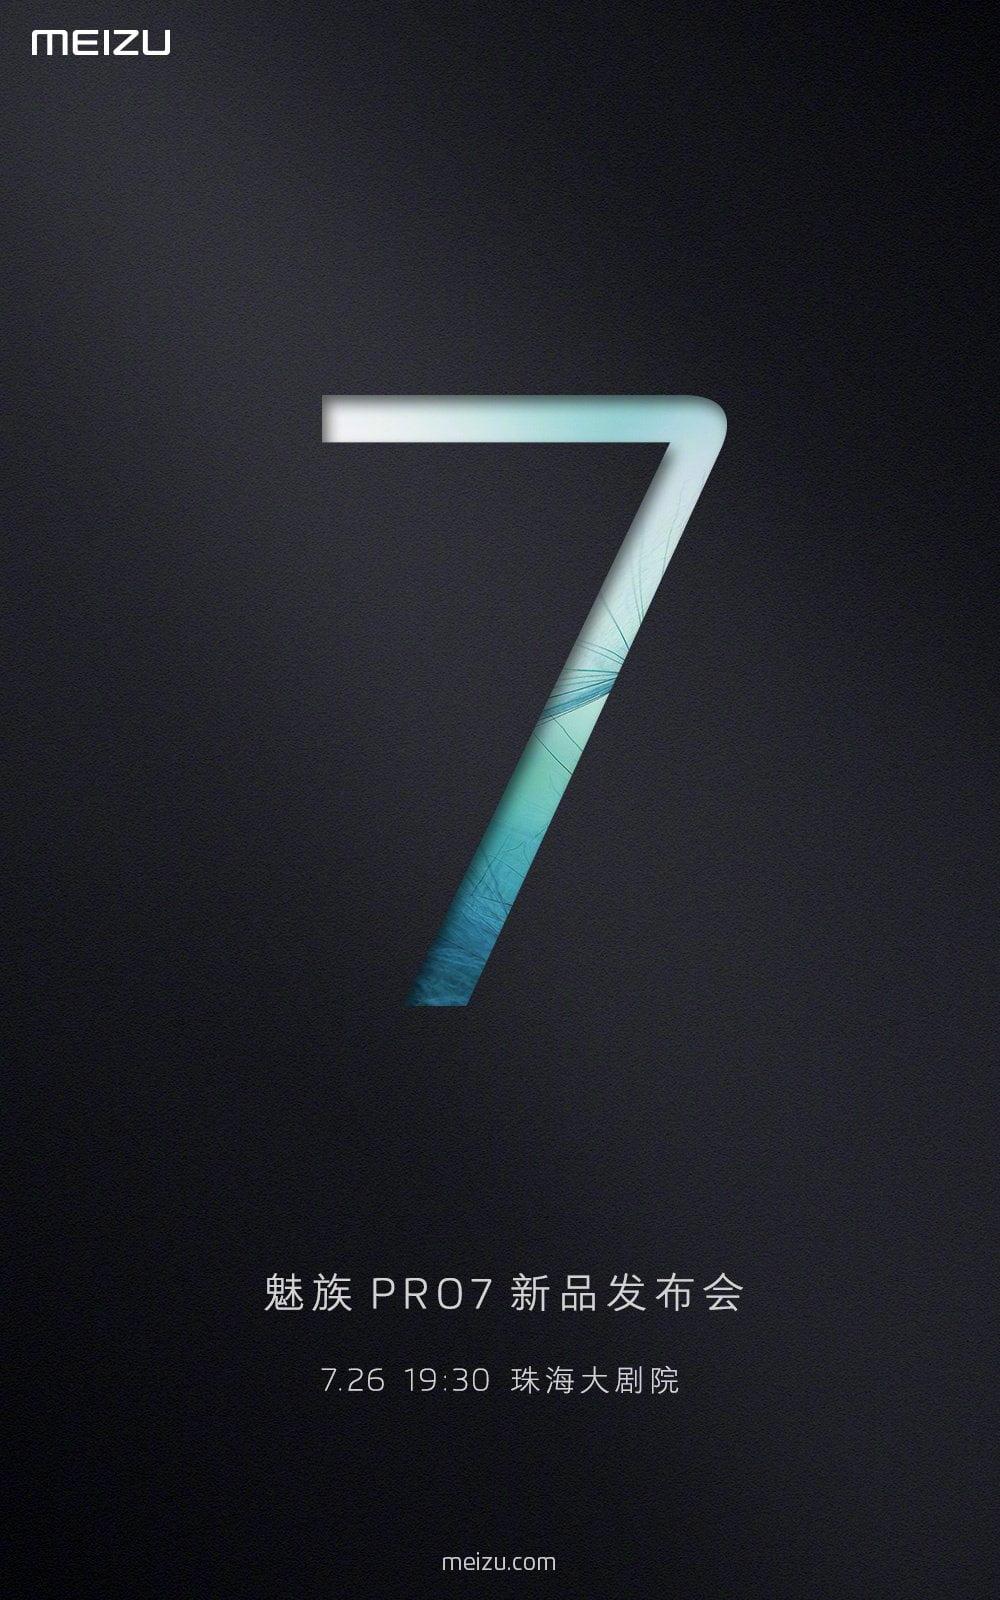 Meizu Pro 7 Teaser